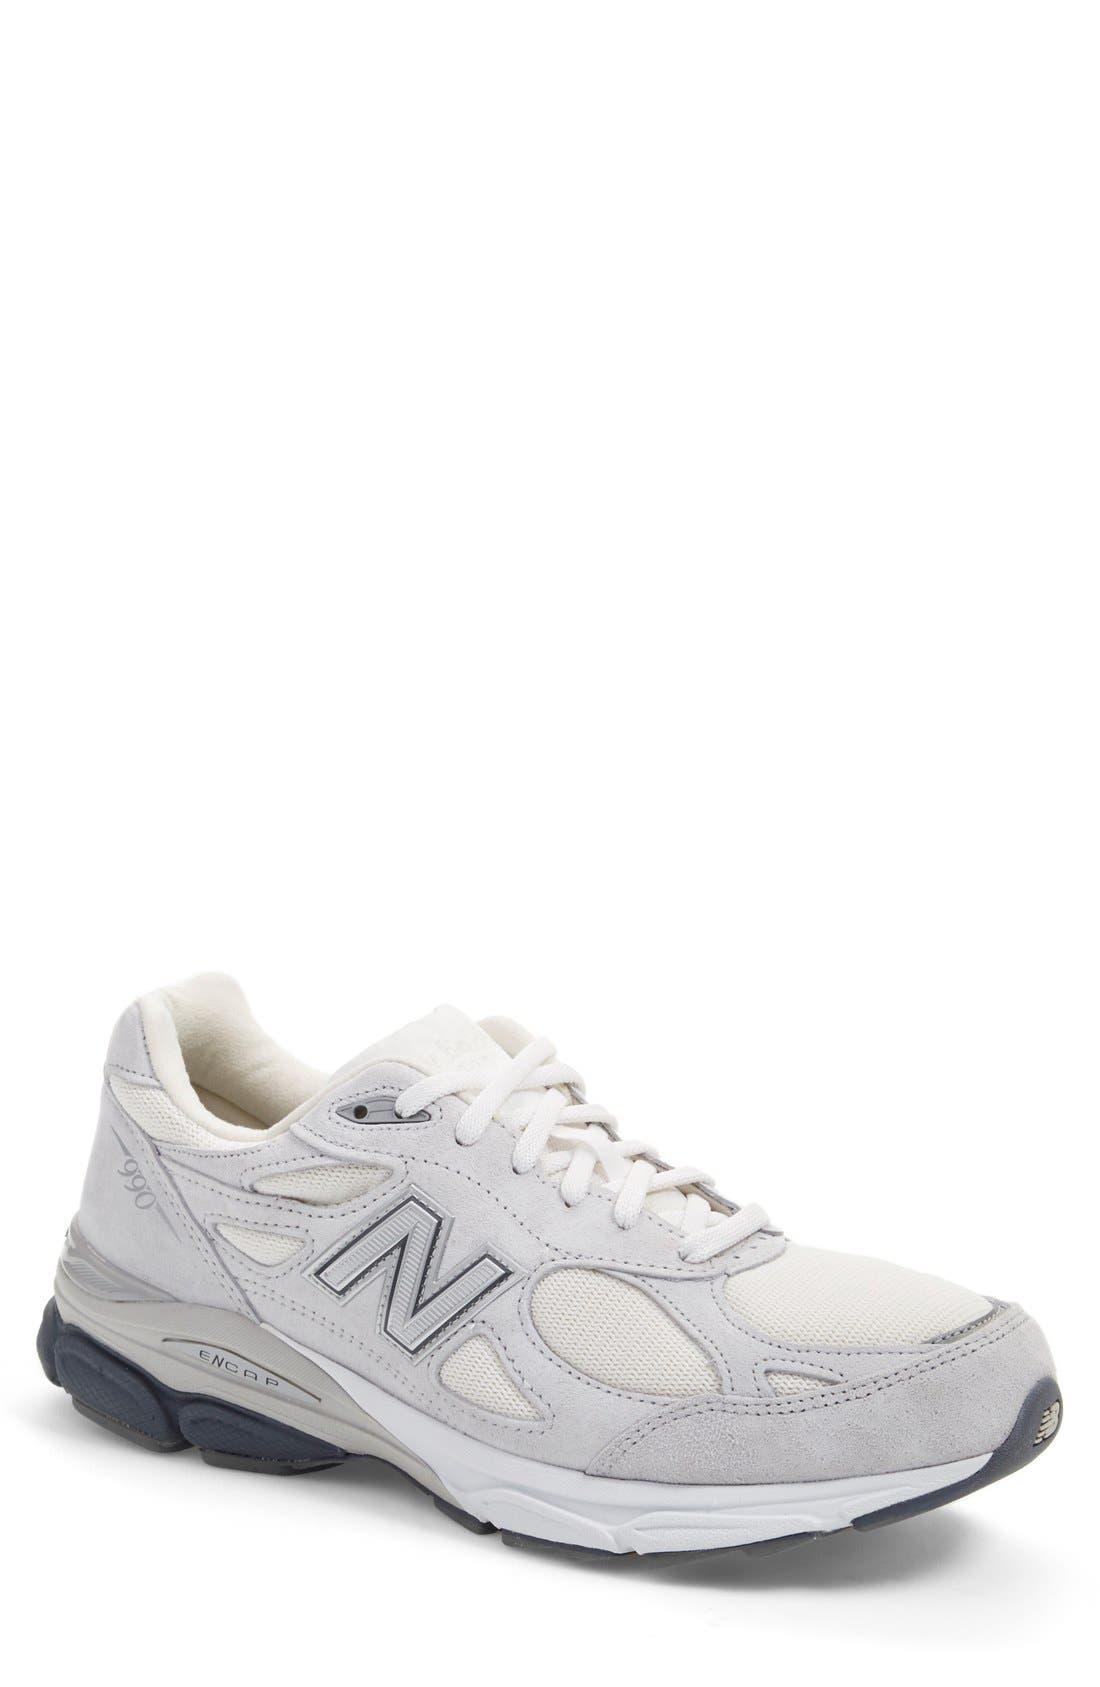 '990v3' Running Shoe,                             Main thumbnail 1, color,                             020